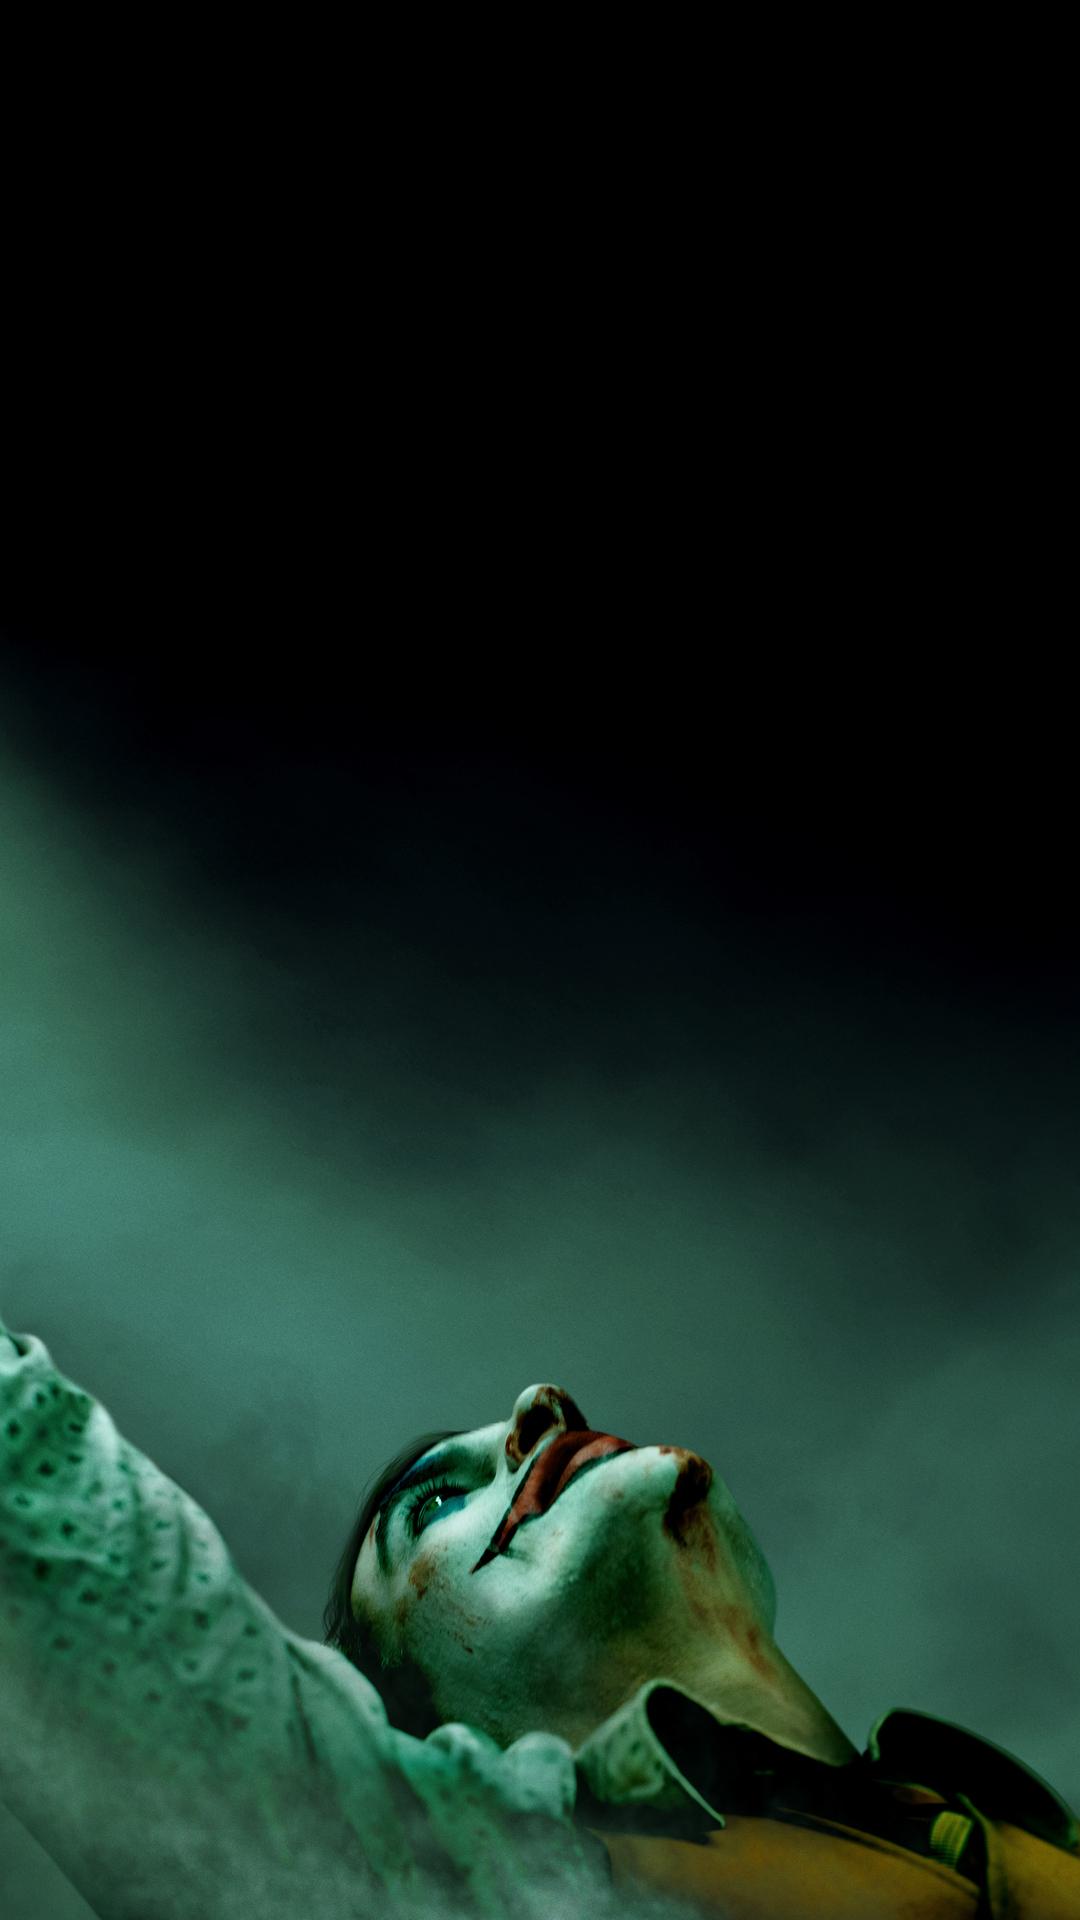 joker-movie-4k-i2.jpg